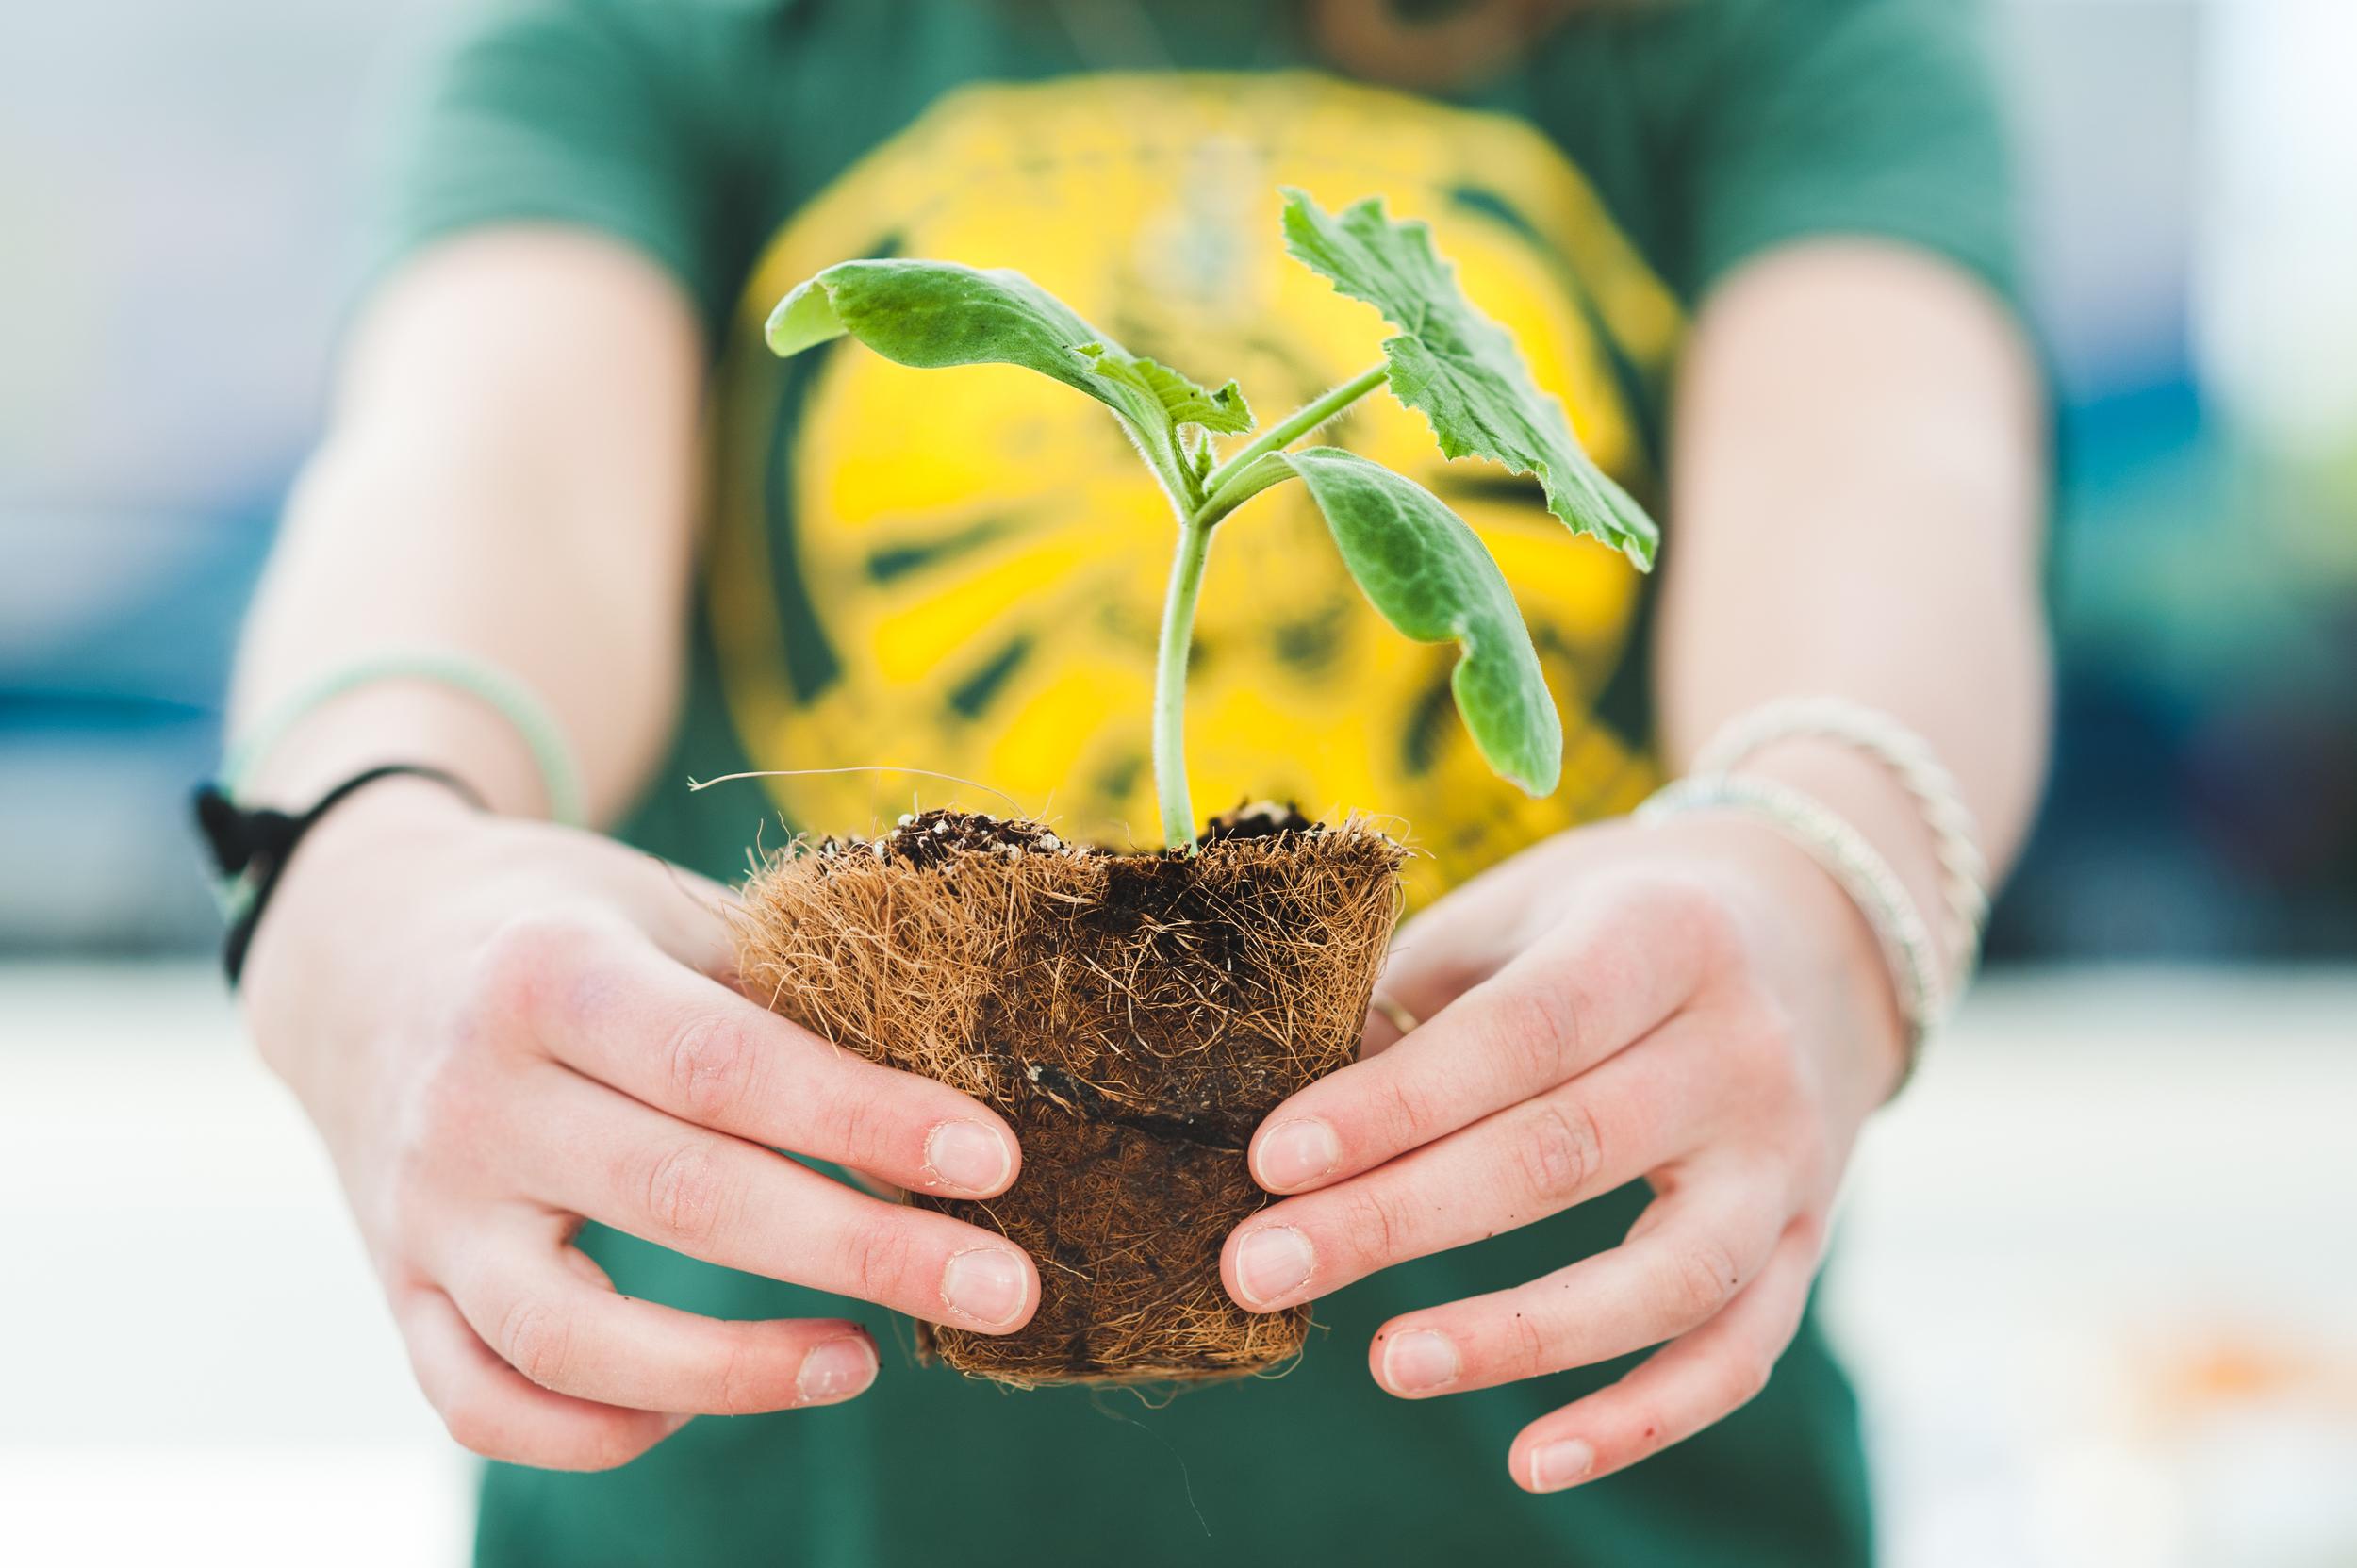 2014 Seedling Sale, Seedlings under grow lights, seedlings with labels, volunteers with Alyssa farming, working in gardens and rows, little girl with seedlings